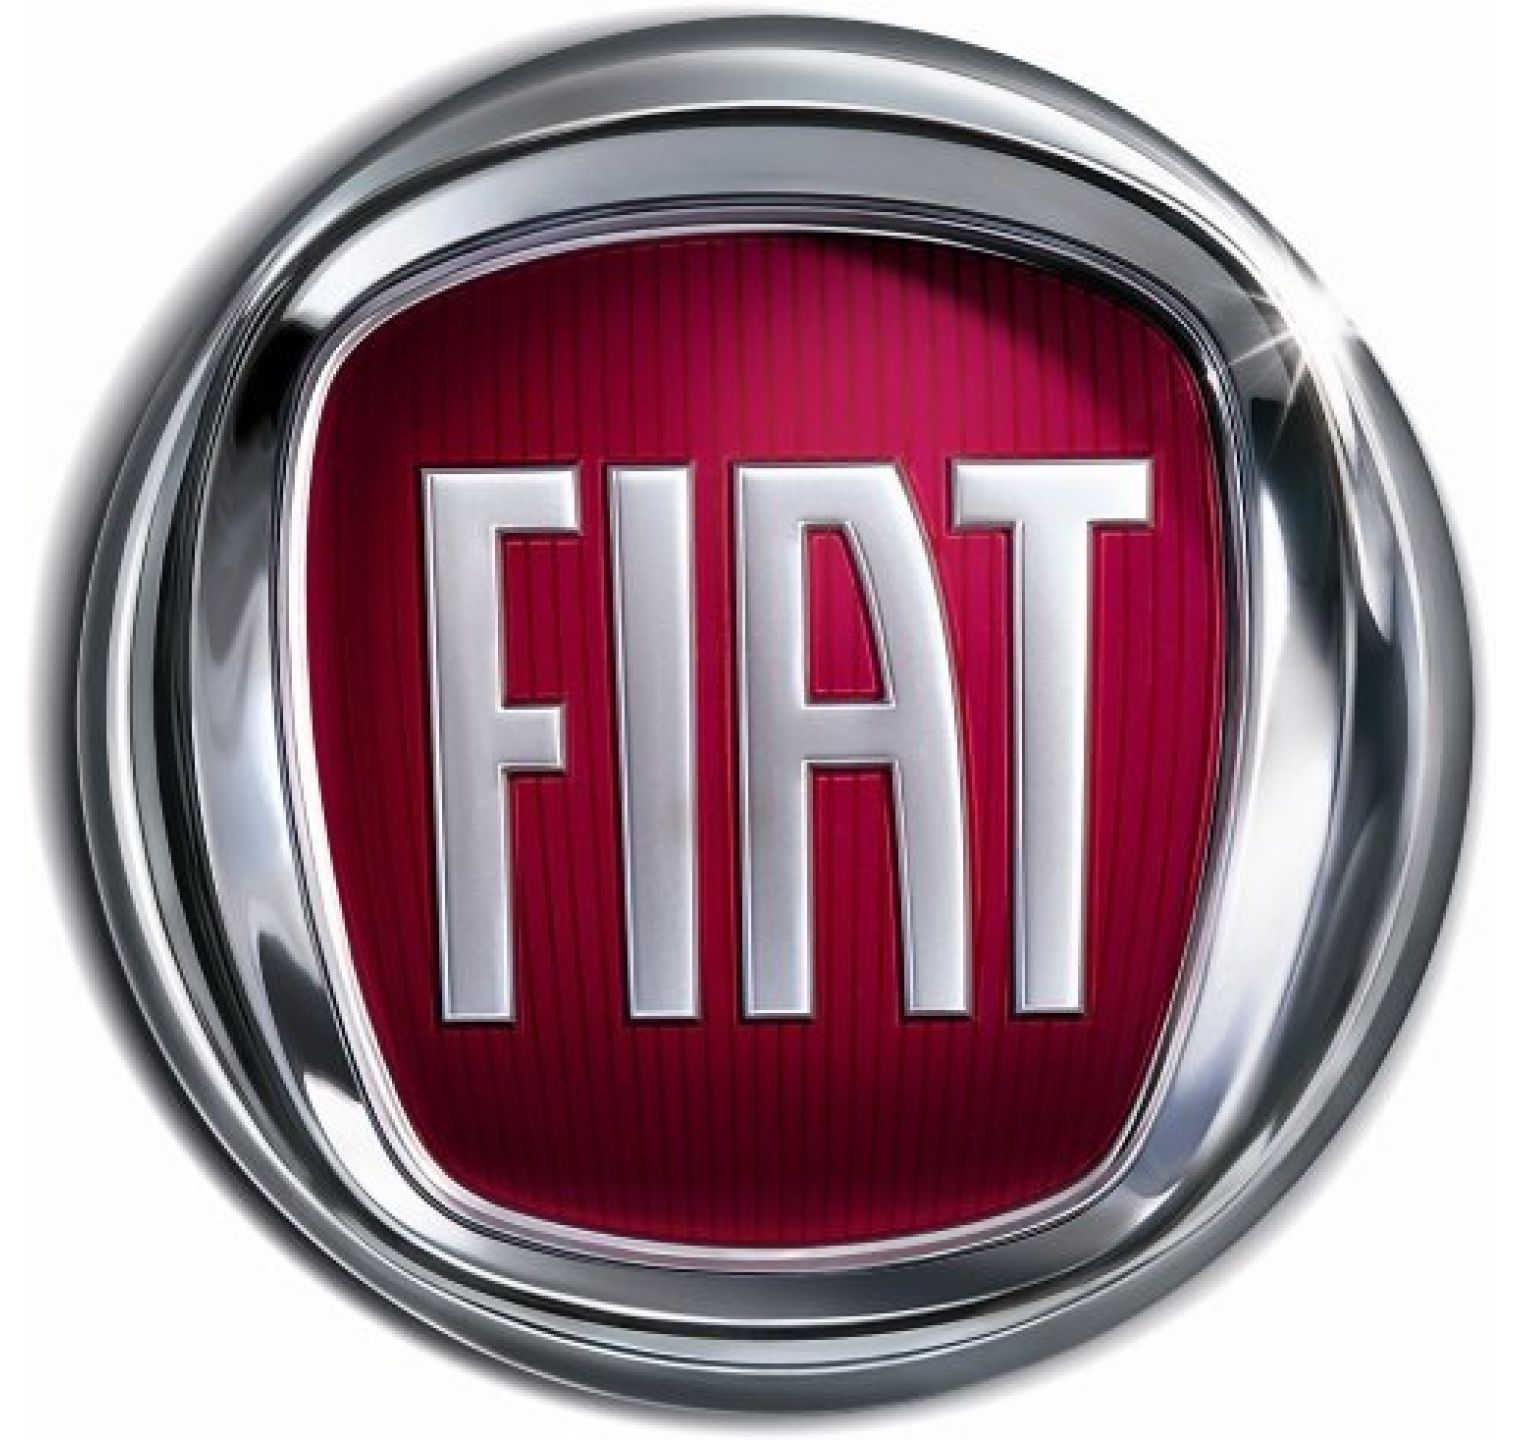 Fiat Grande Punto (vanaf 2005) - set ruitenwissers Valeo Silencio flatblade